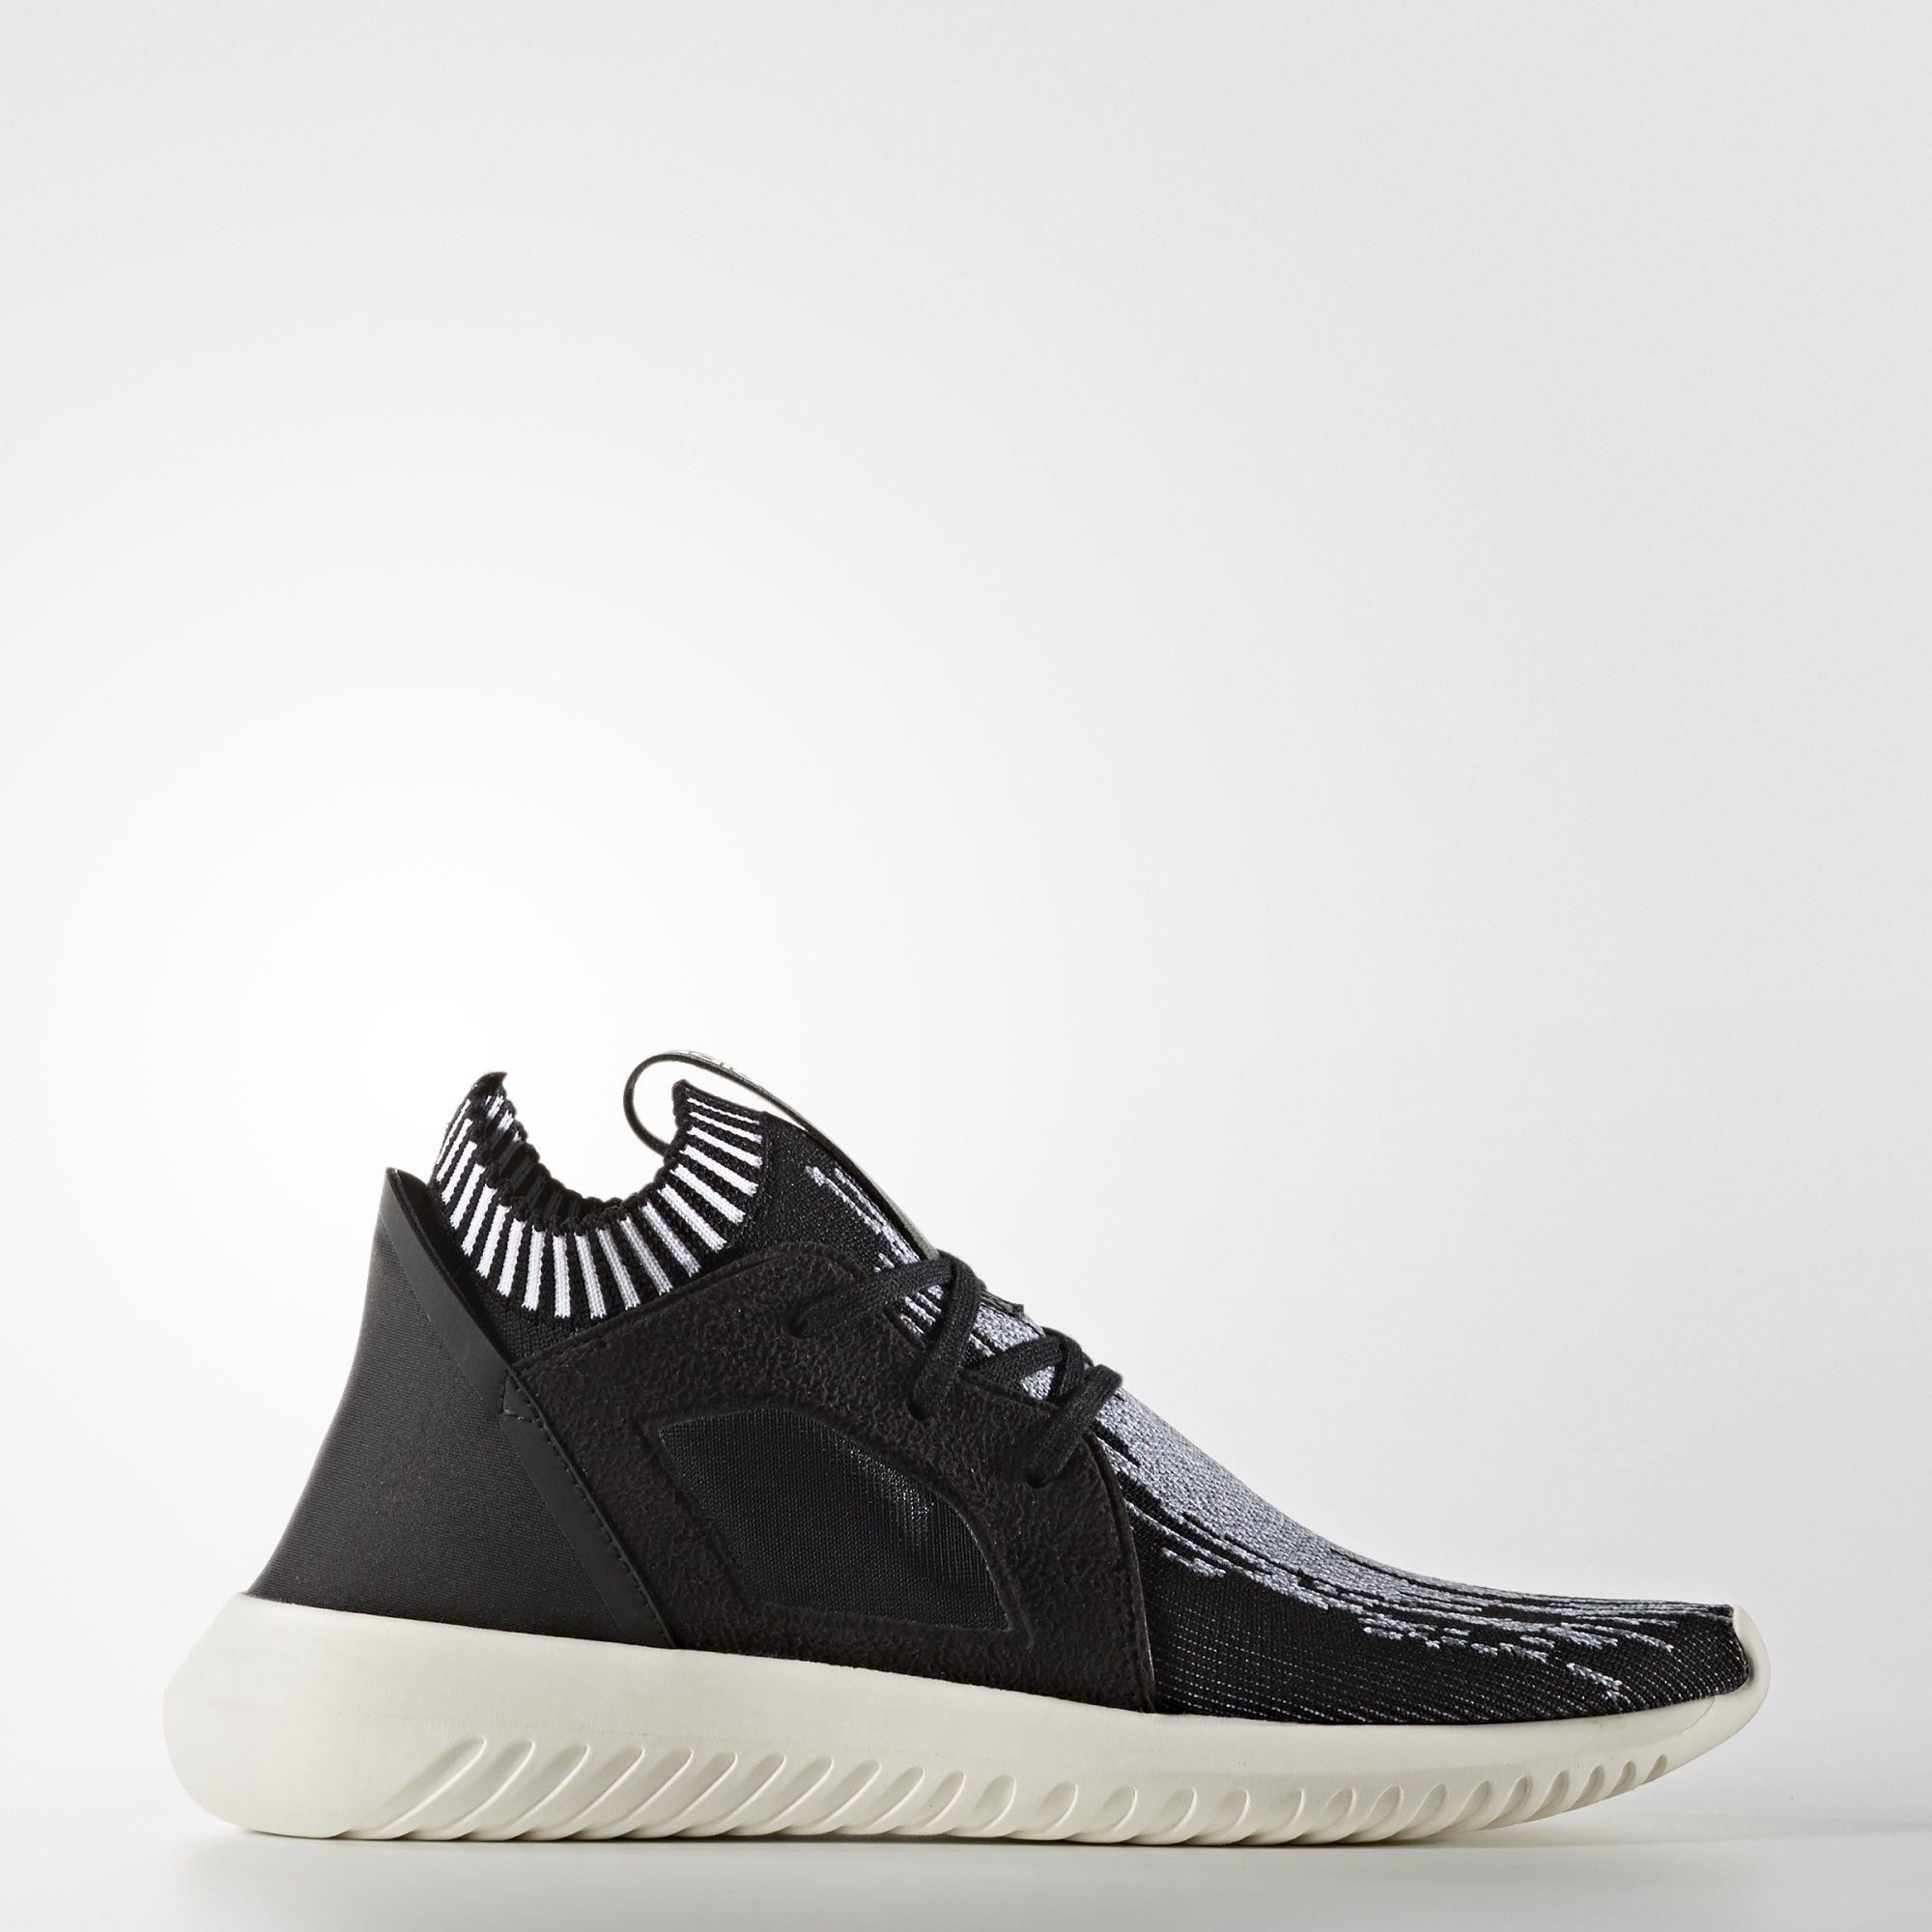 the best attitude 89707 98040 adidas - Women s Tubular Defiant Primeknit Shoes   Clothes   Adidas, Adidas  sneakers, Adidas canada